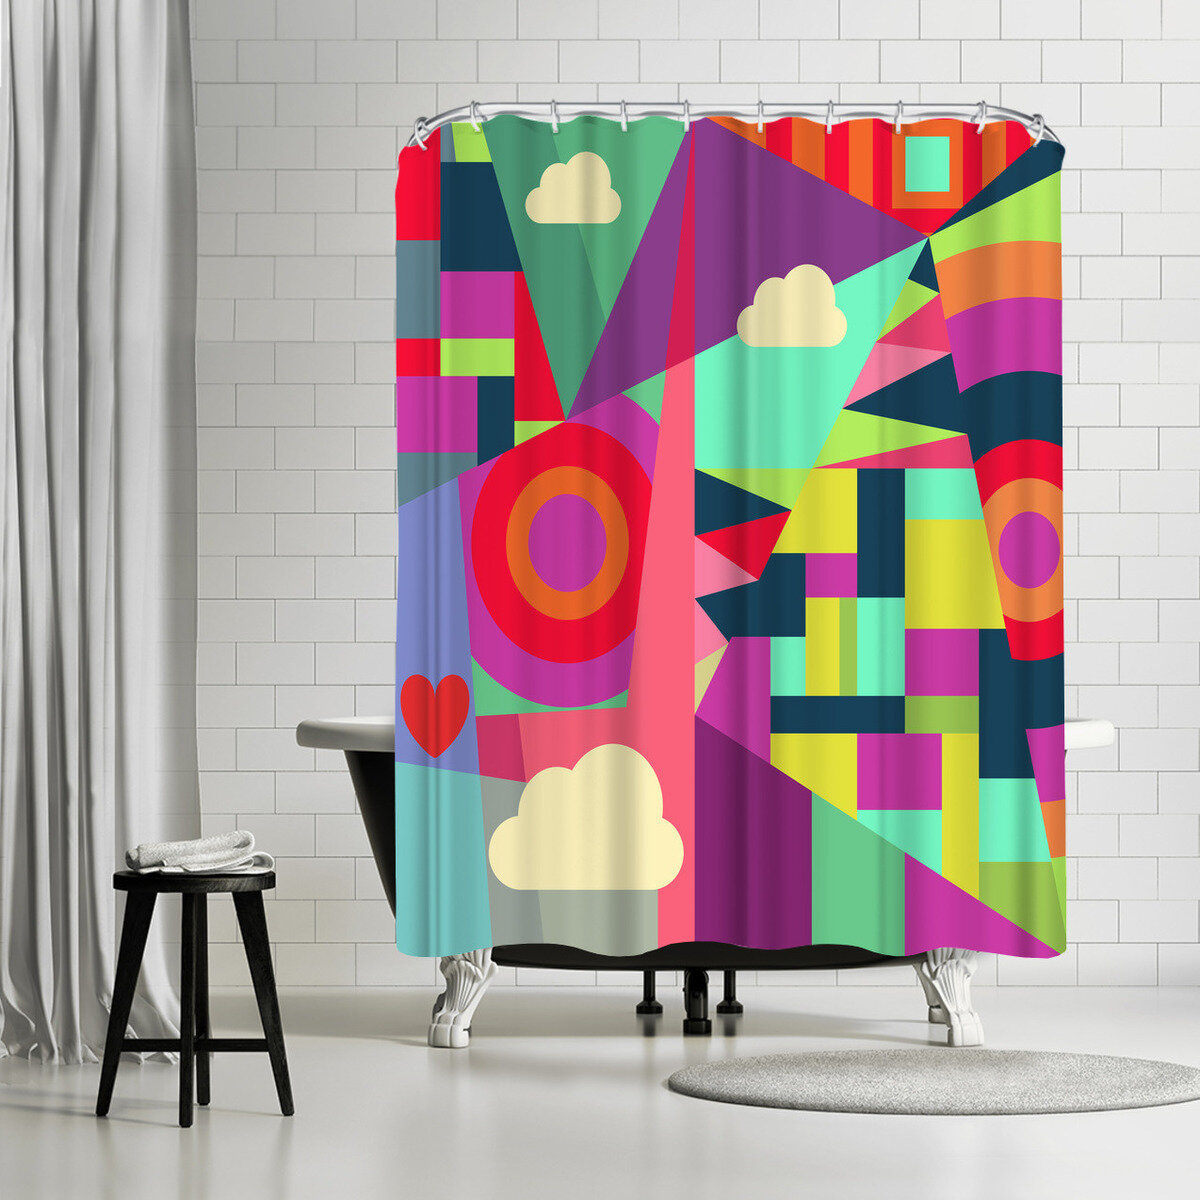 East Urban Home Susana Paz Geometric 7 Single Shower Curtain Wayfair